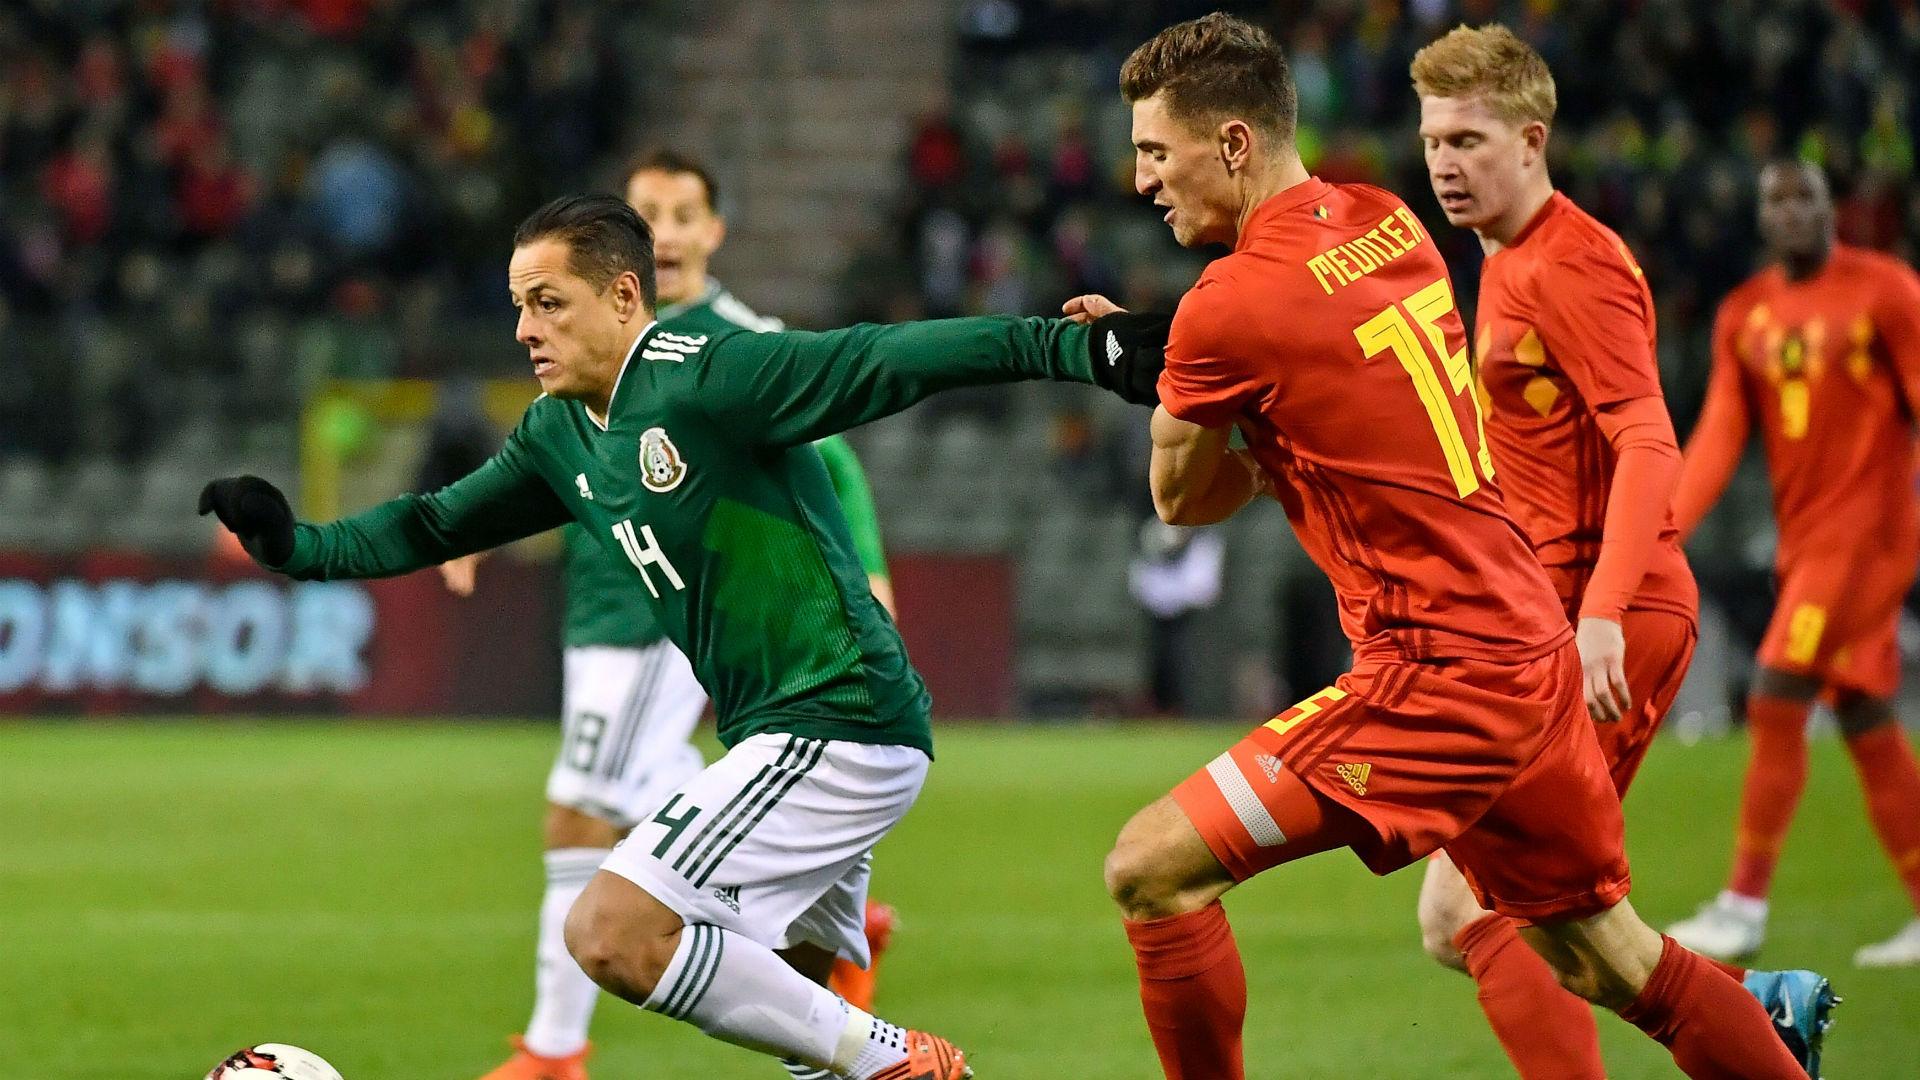 Javier-hernandez-thomas-meunier-belgiun-mexico-international-friendly_dxx5z353tw5f1tuth3vgoboy0